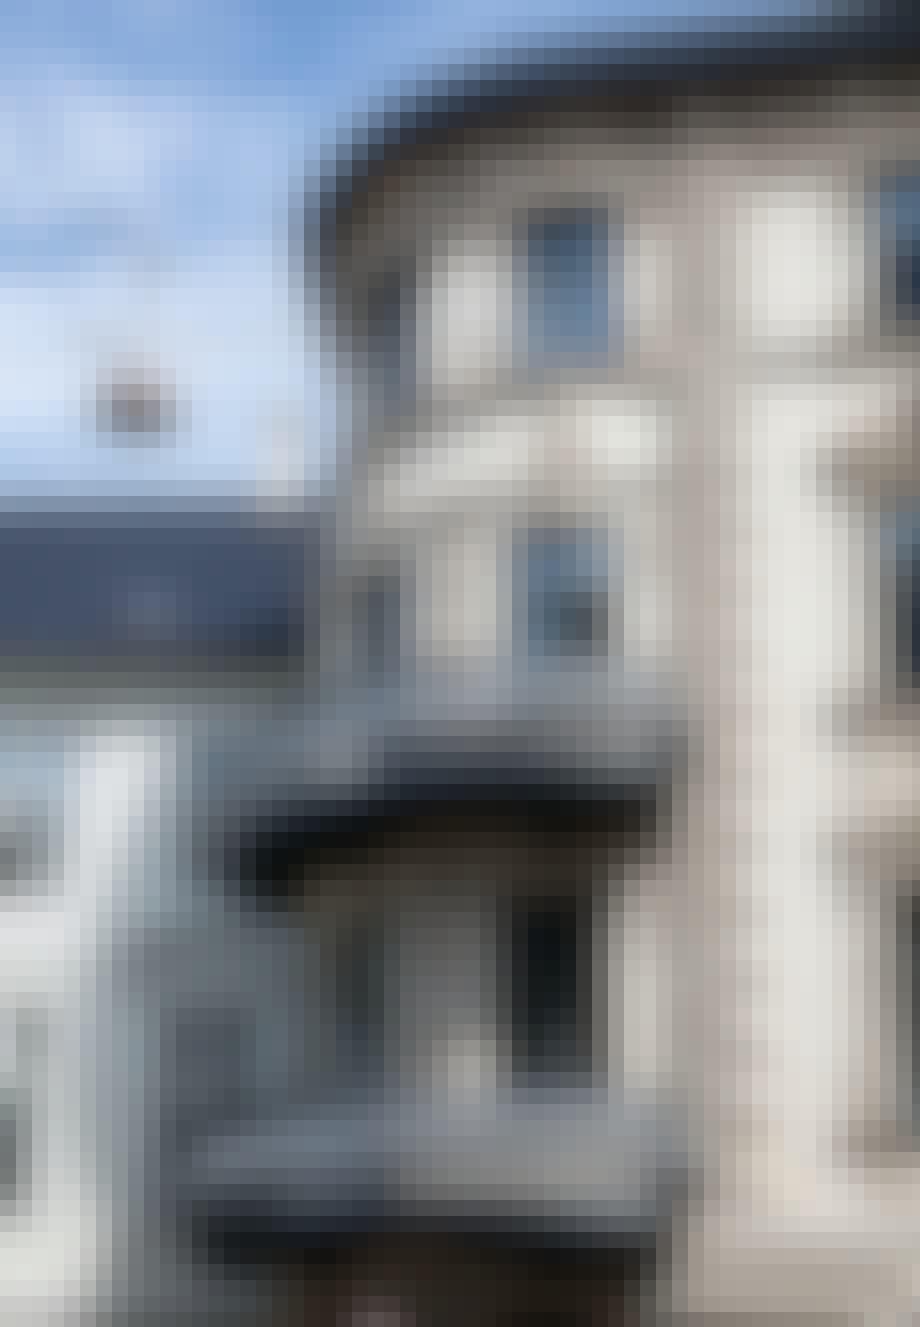 Hus med forskelligfarvede rum